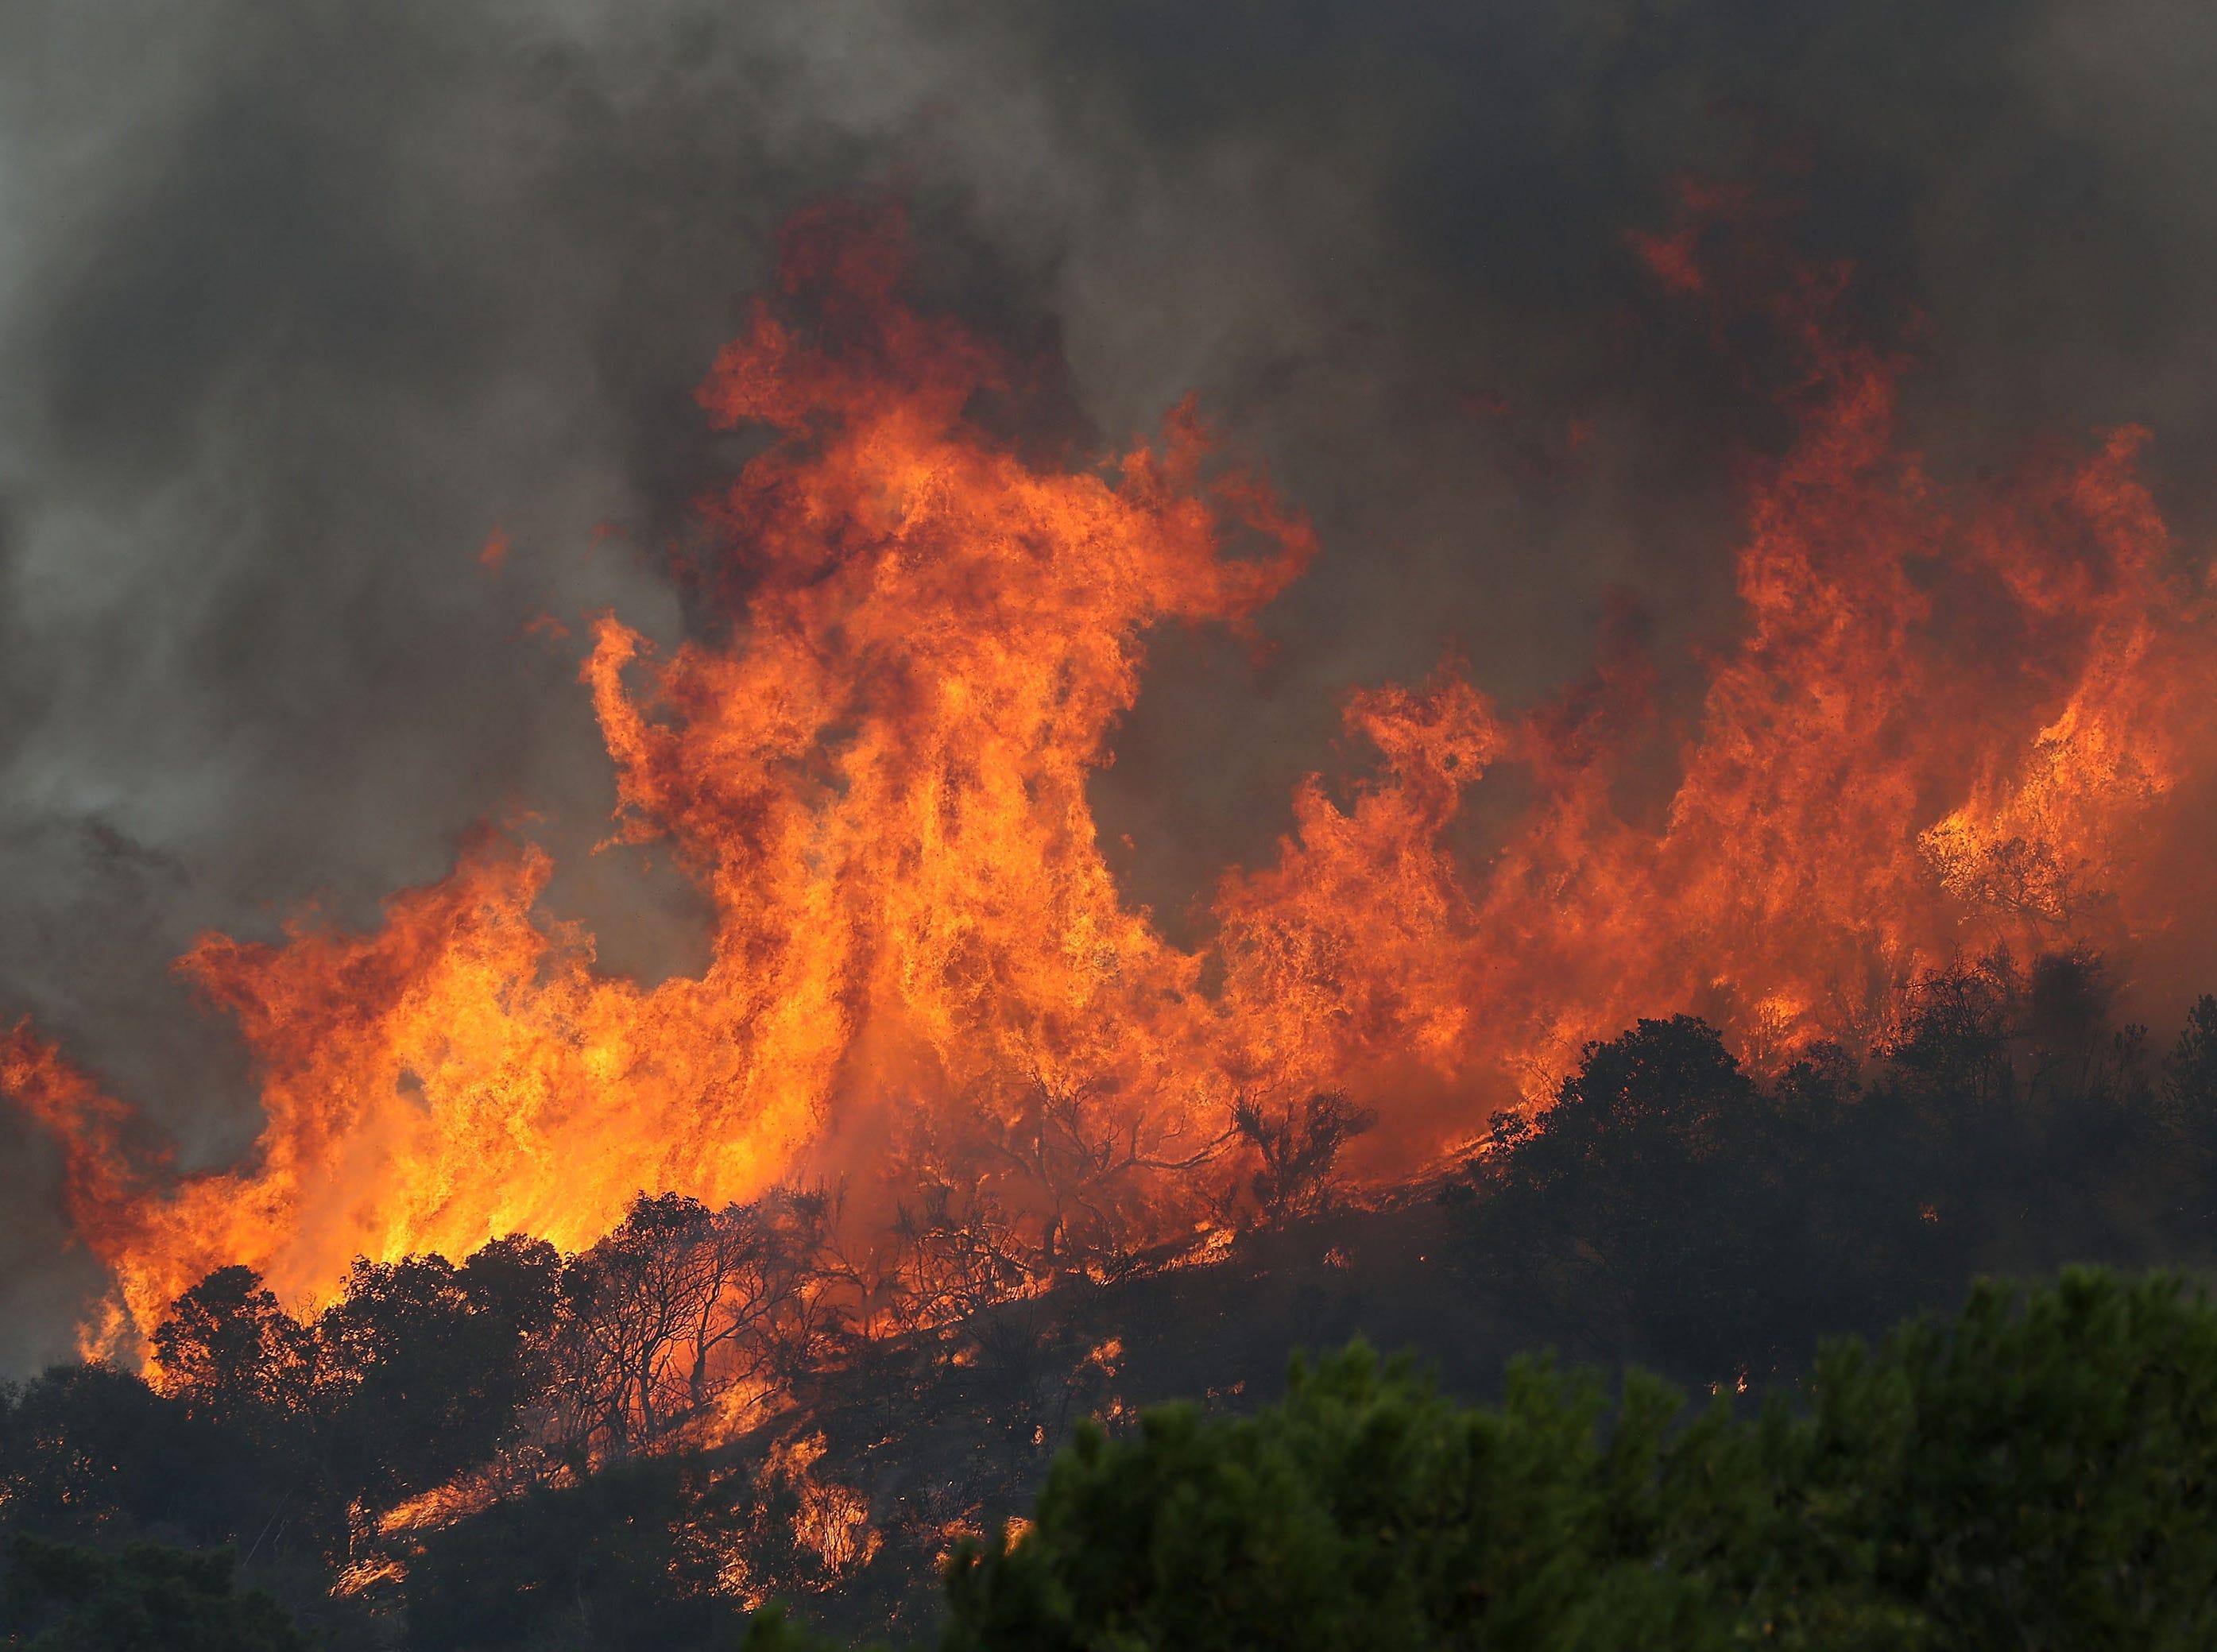 Flames from the Woolsey Fire threaten hillside homes in Westlake Village, Ca., Nov. 9, 2018.